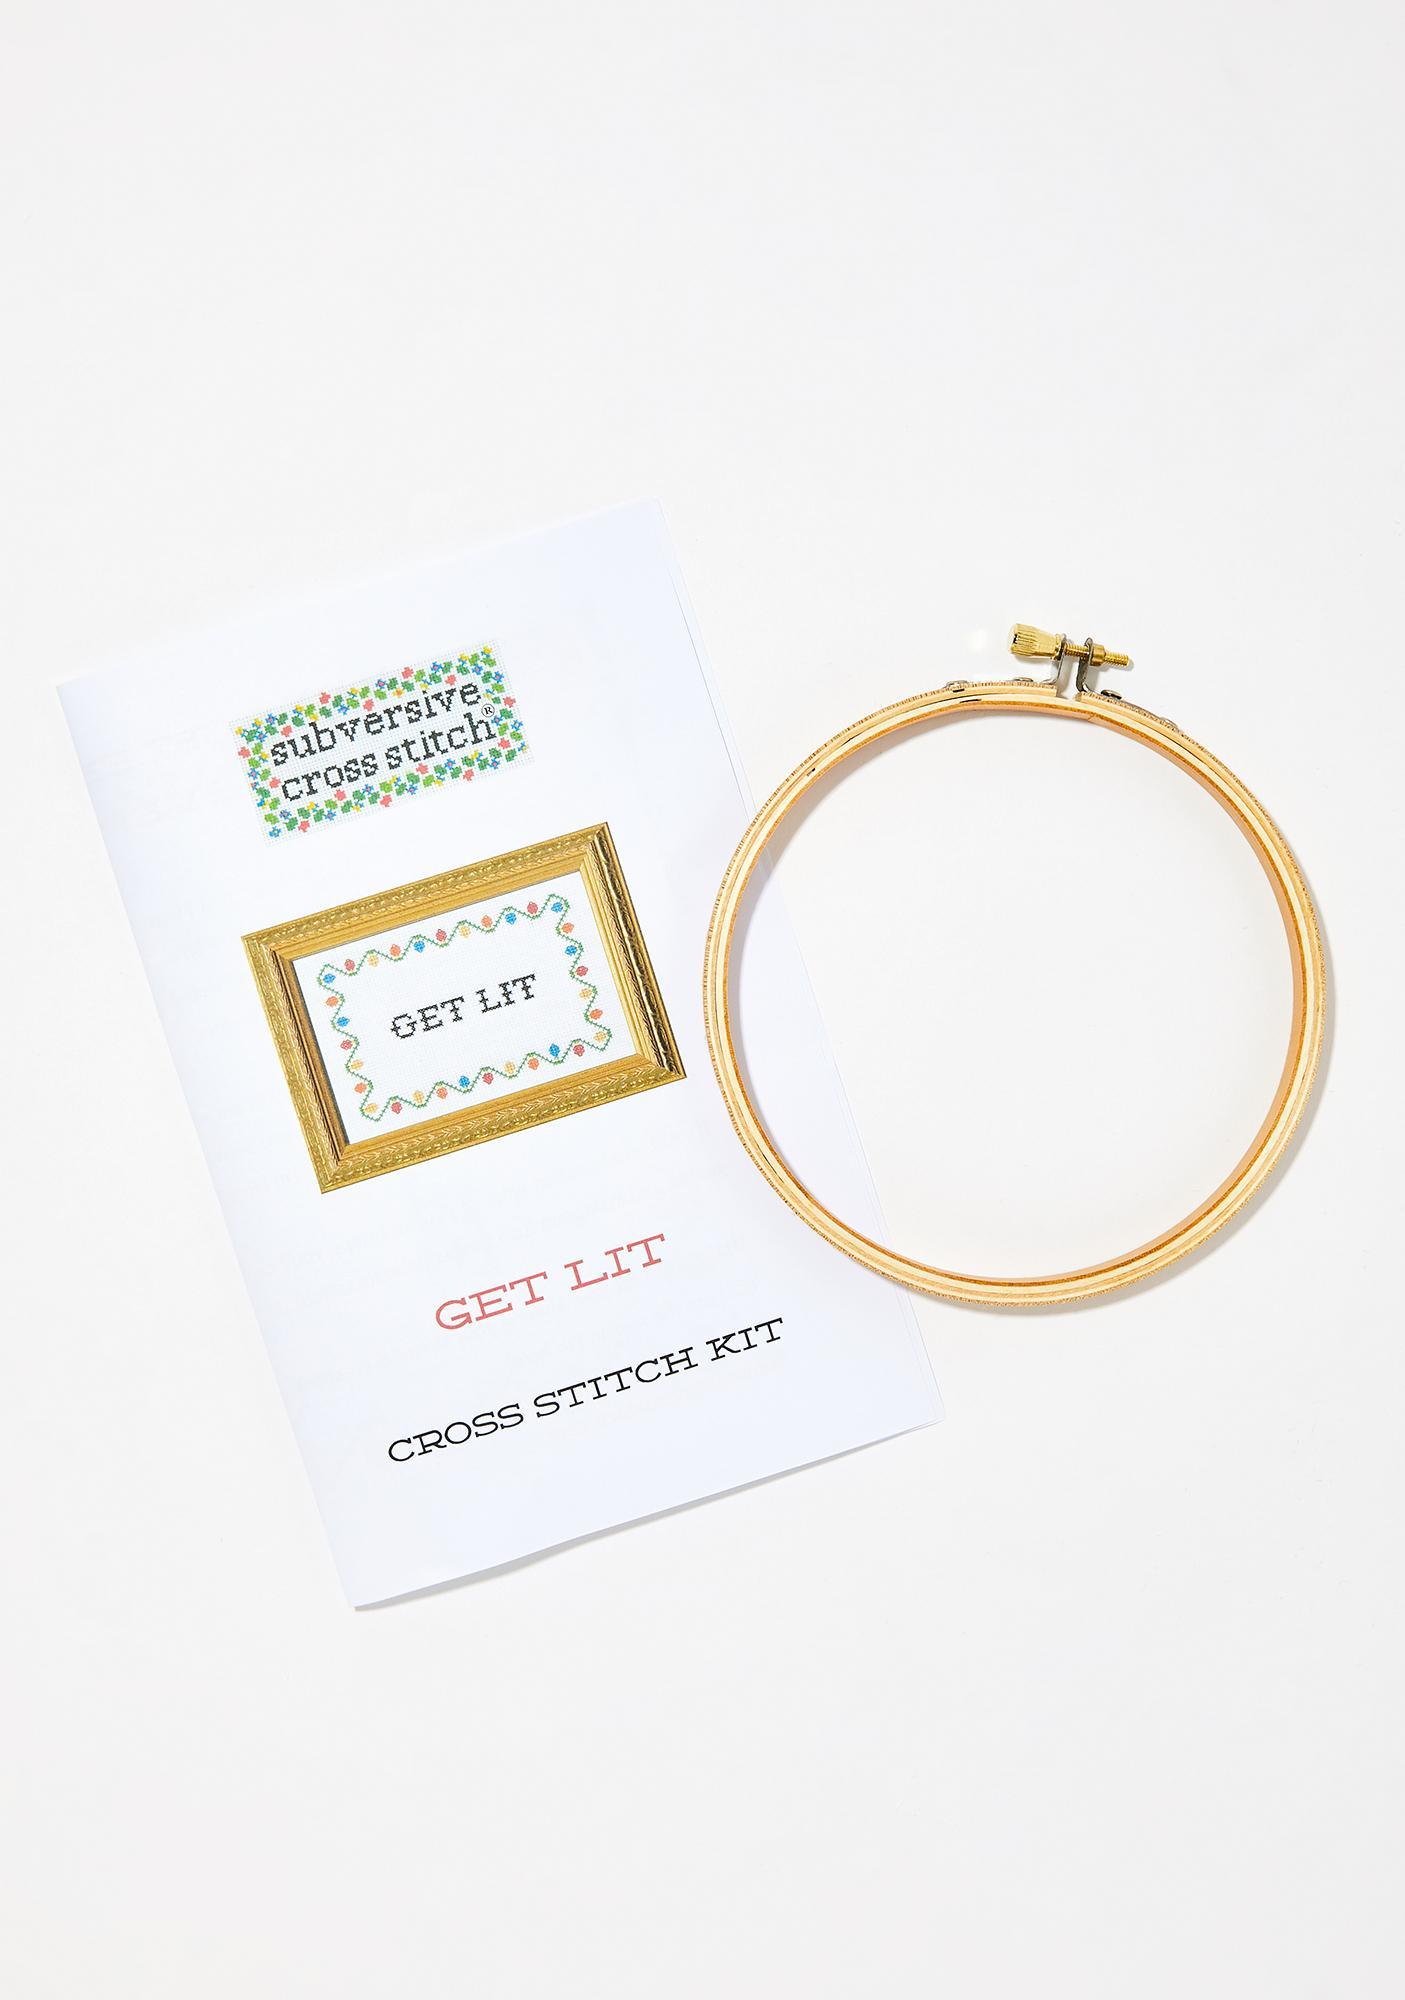 Subversive Cross Stitch Get Lit Stitching Kit